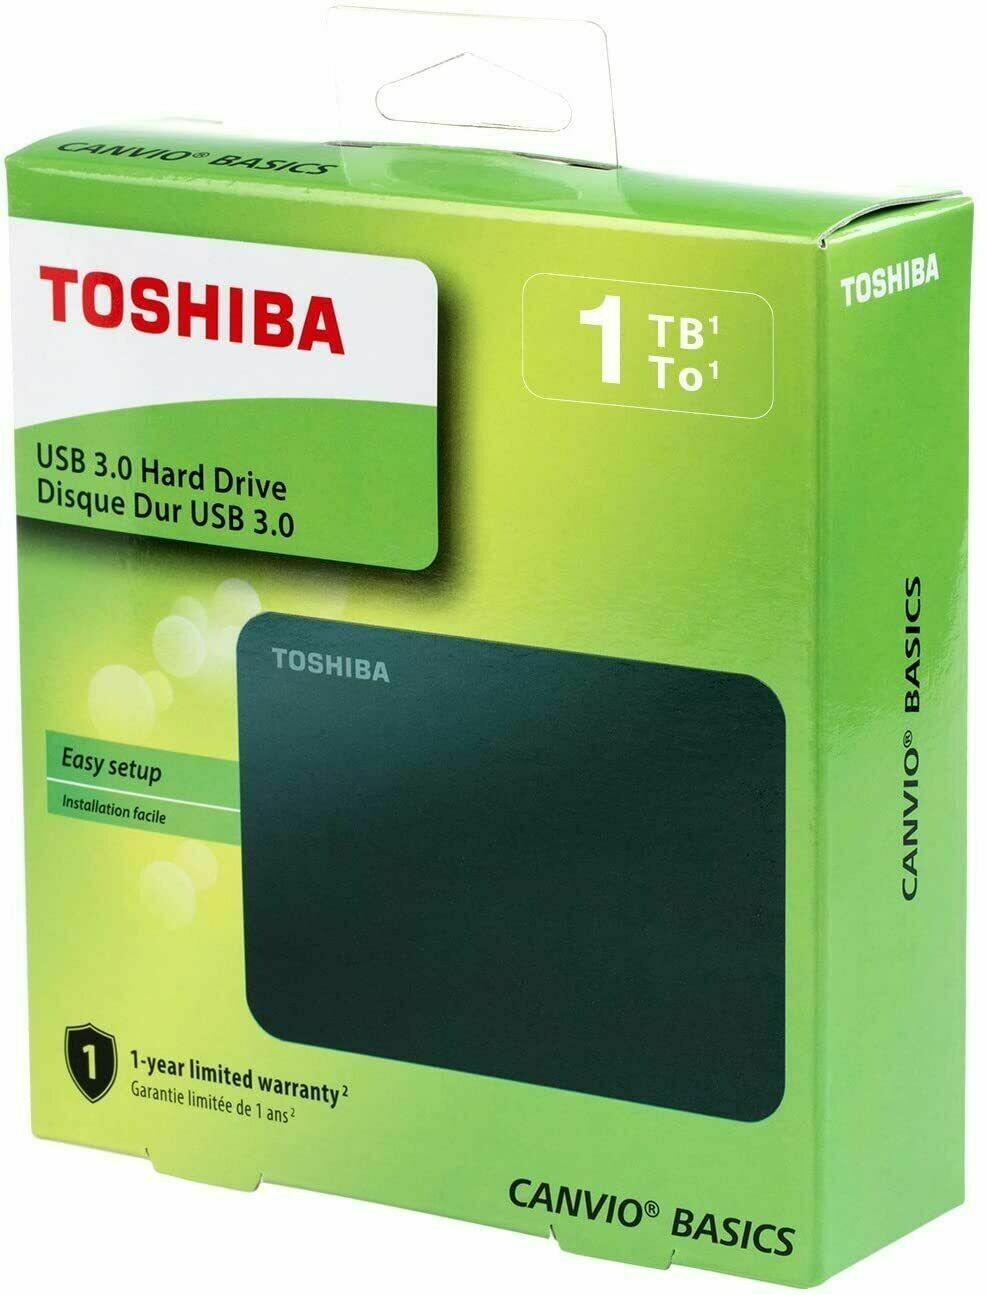 Toshiba Canvio 4TB